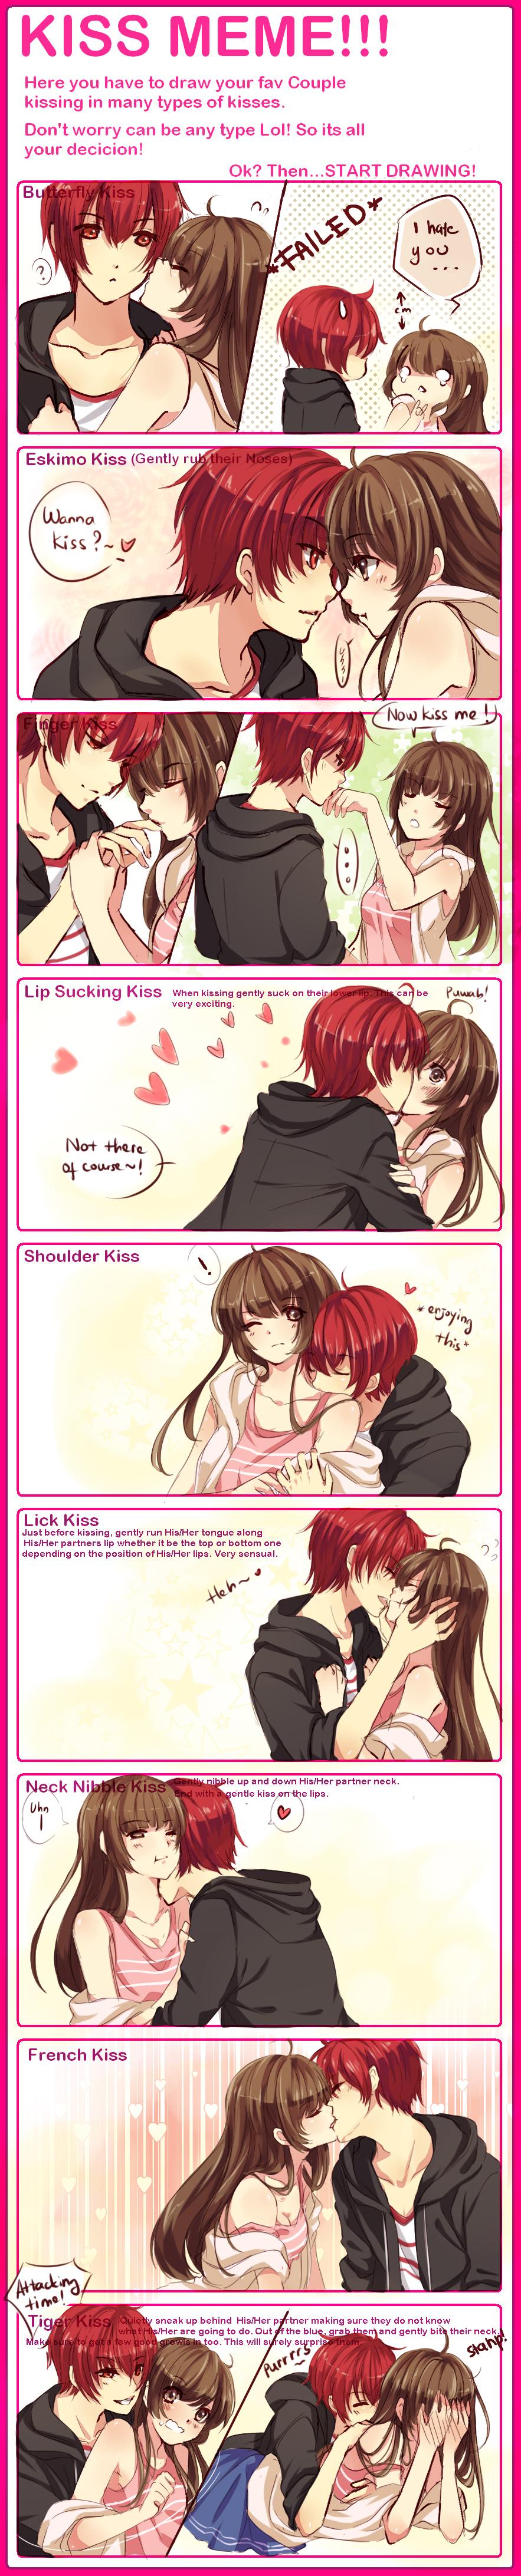 kissumeme1_copy_by_omocha_san d6zx0l4 kiss meme with waifuuuu by zenithomocha on deviantart